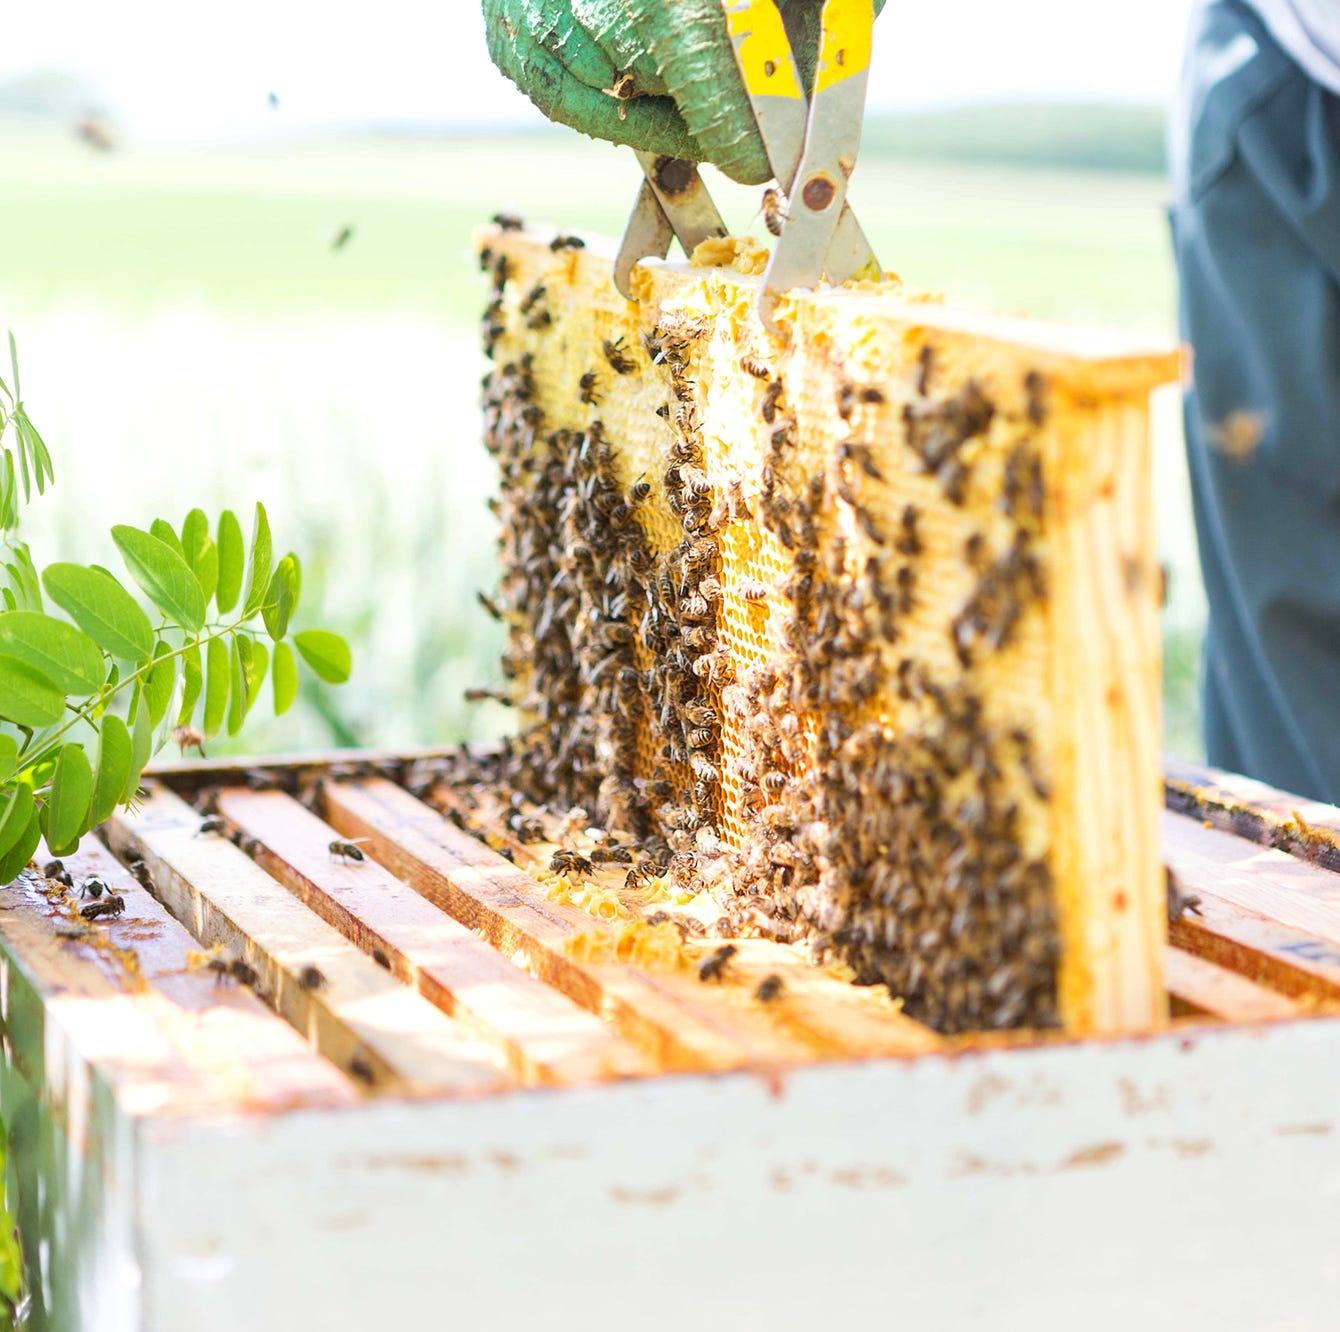 Home Advisor: 5 tips for aspiring beekeepers